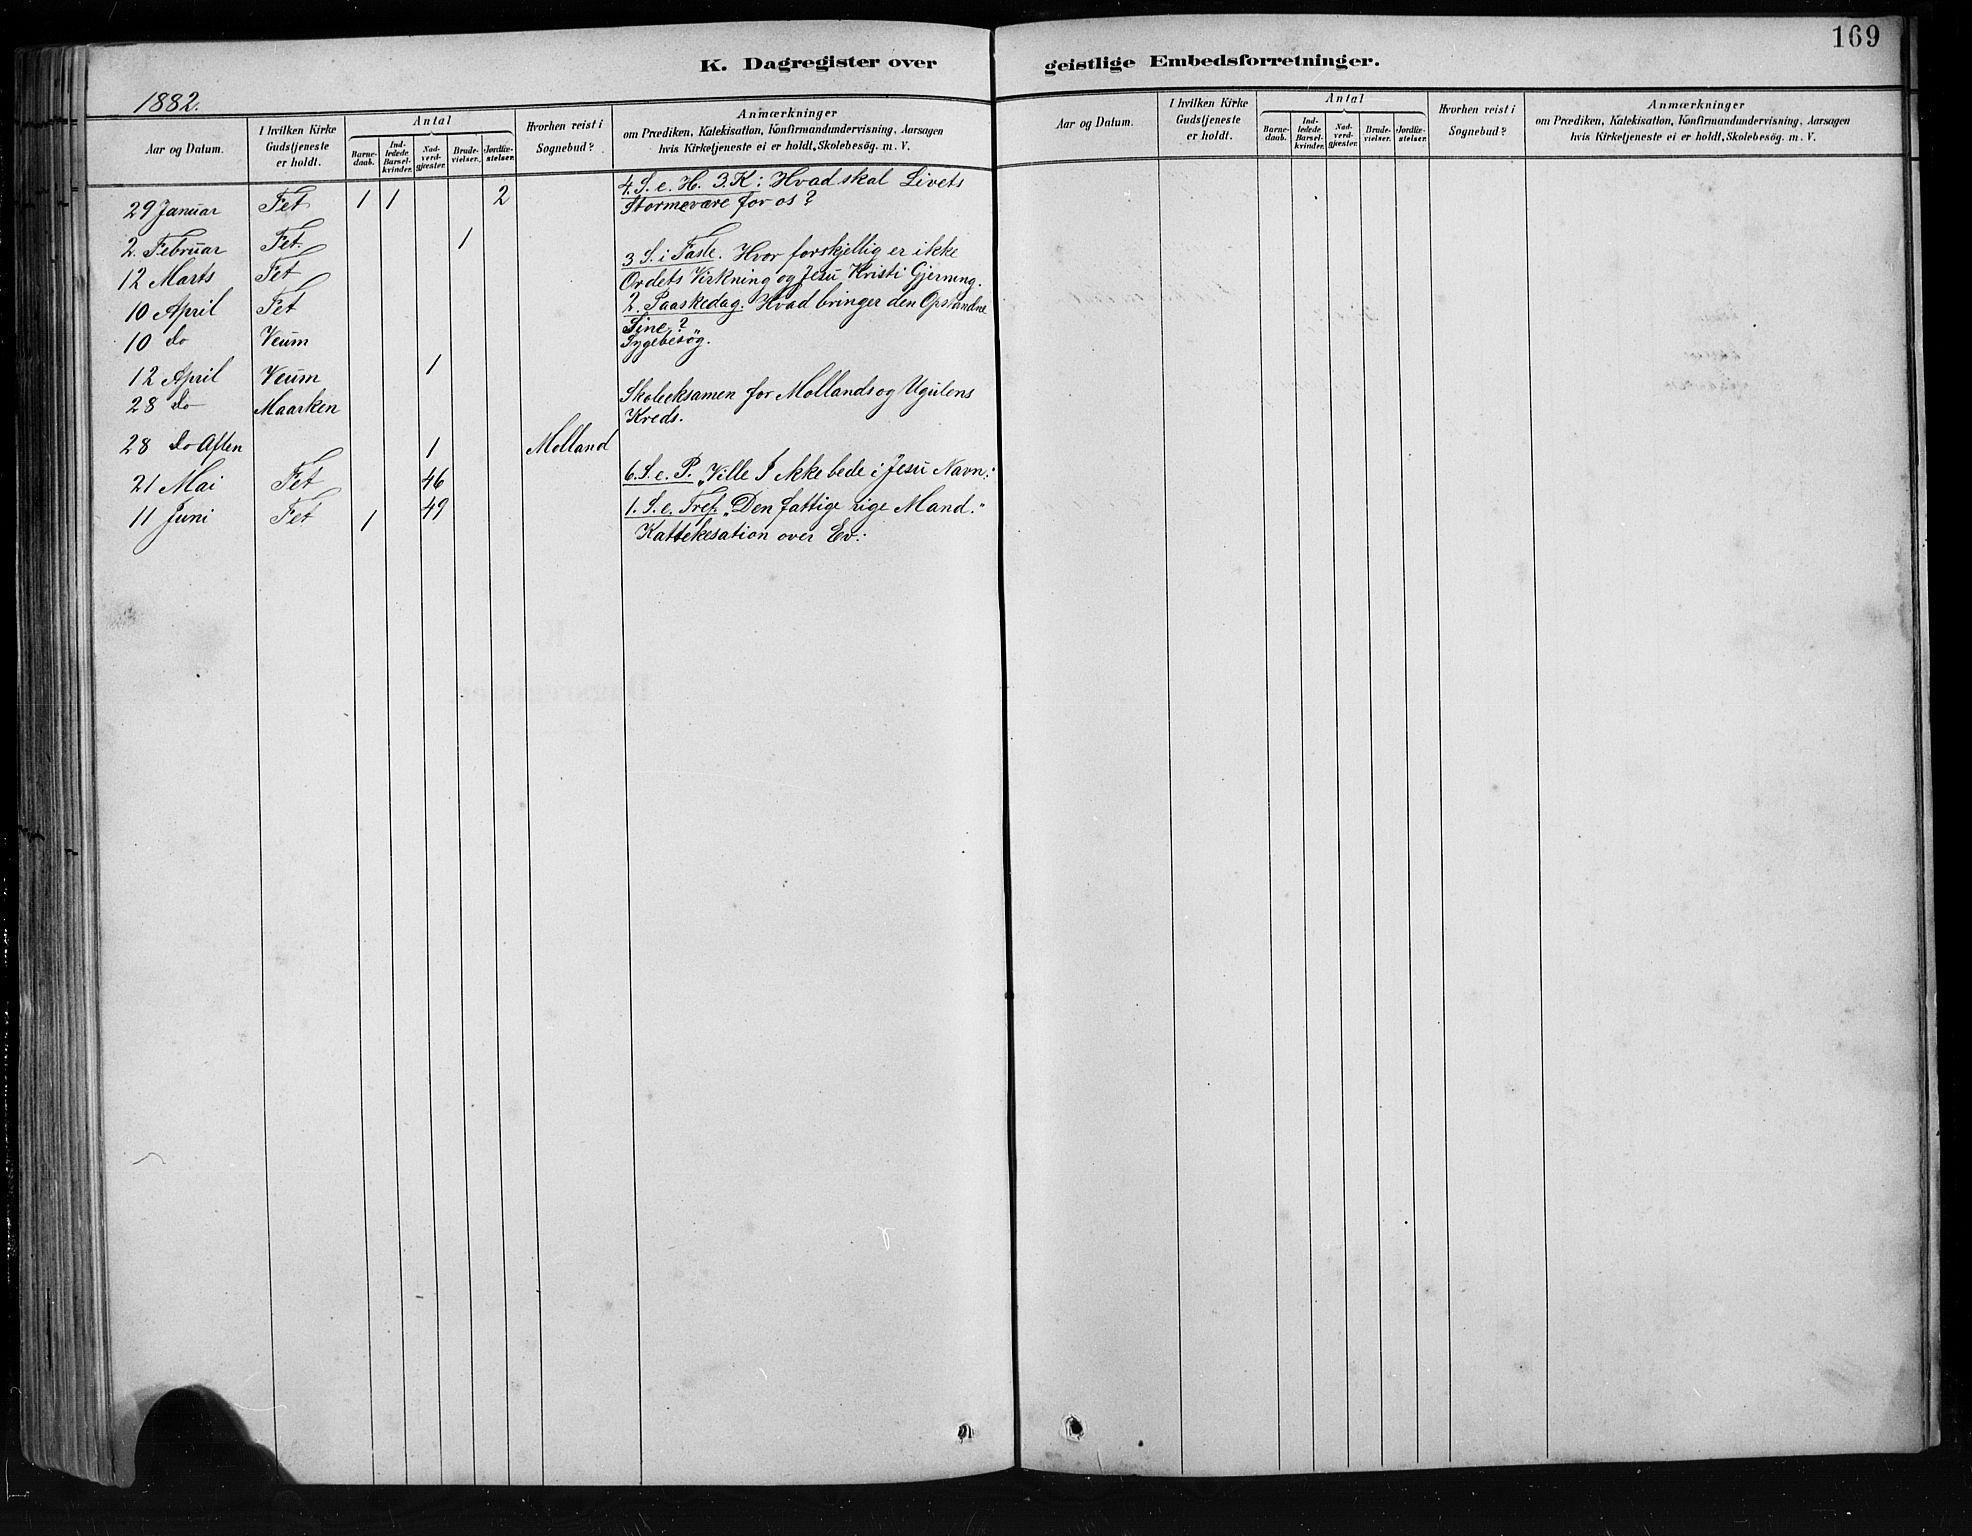 SAB, Jostedal sokneprestembete, H/Hab/Habb/L0001: Klokkerbok nr. B 1, 1882-1921, s. 169